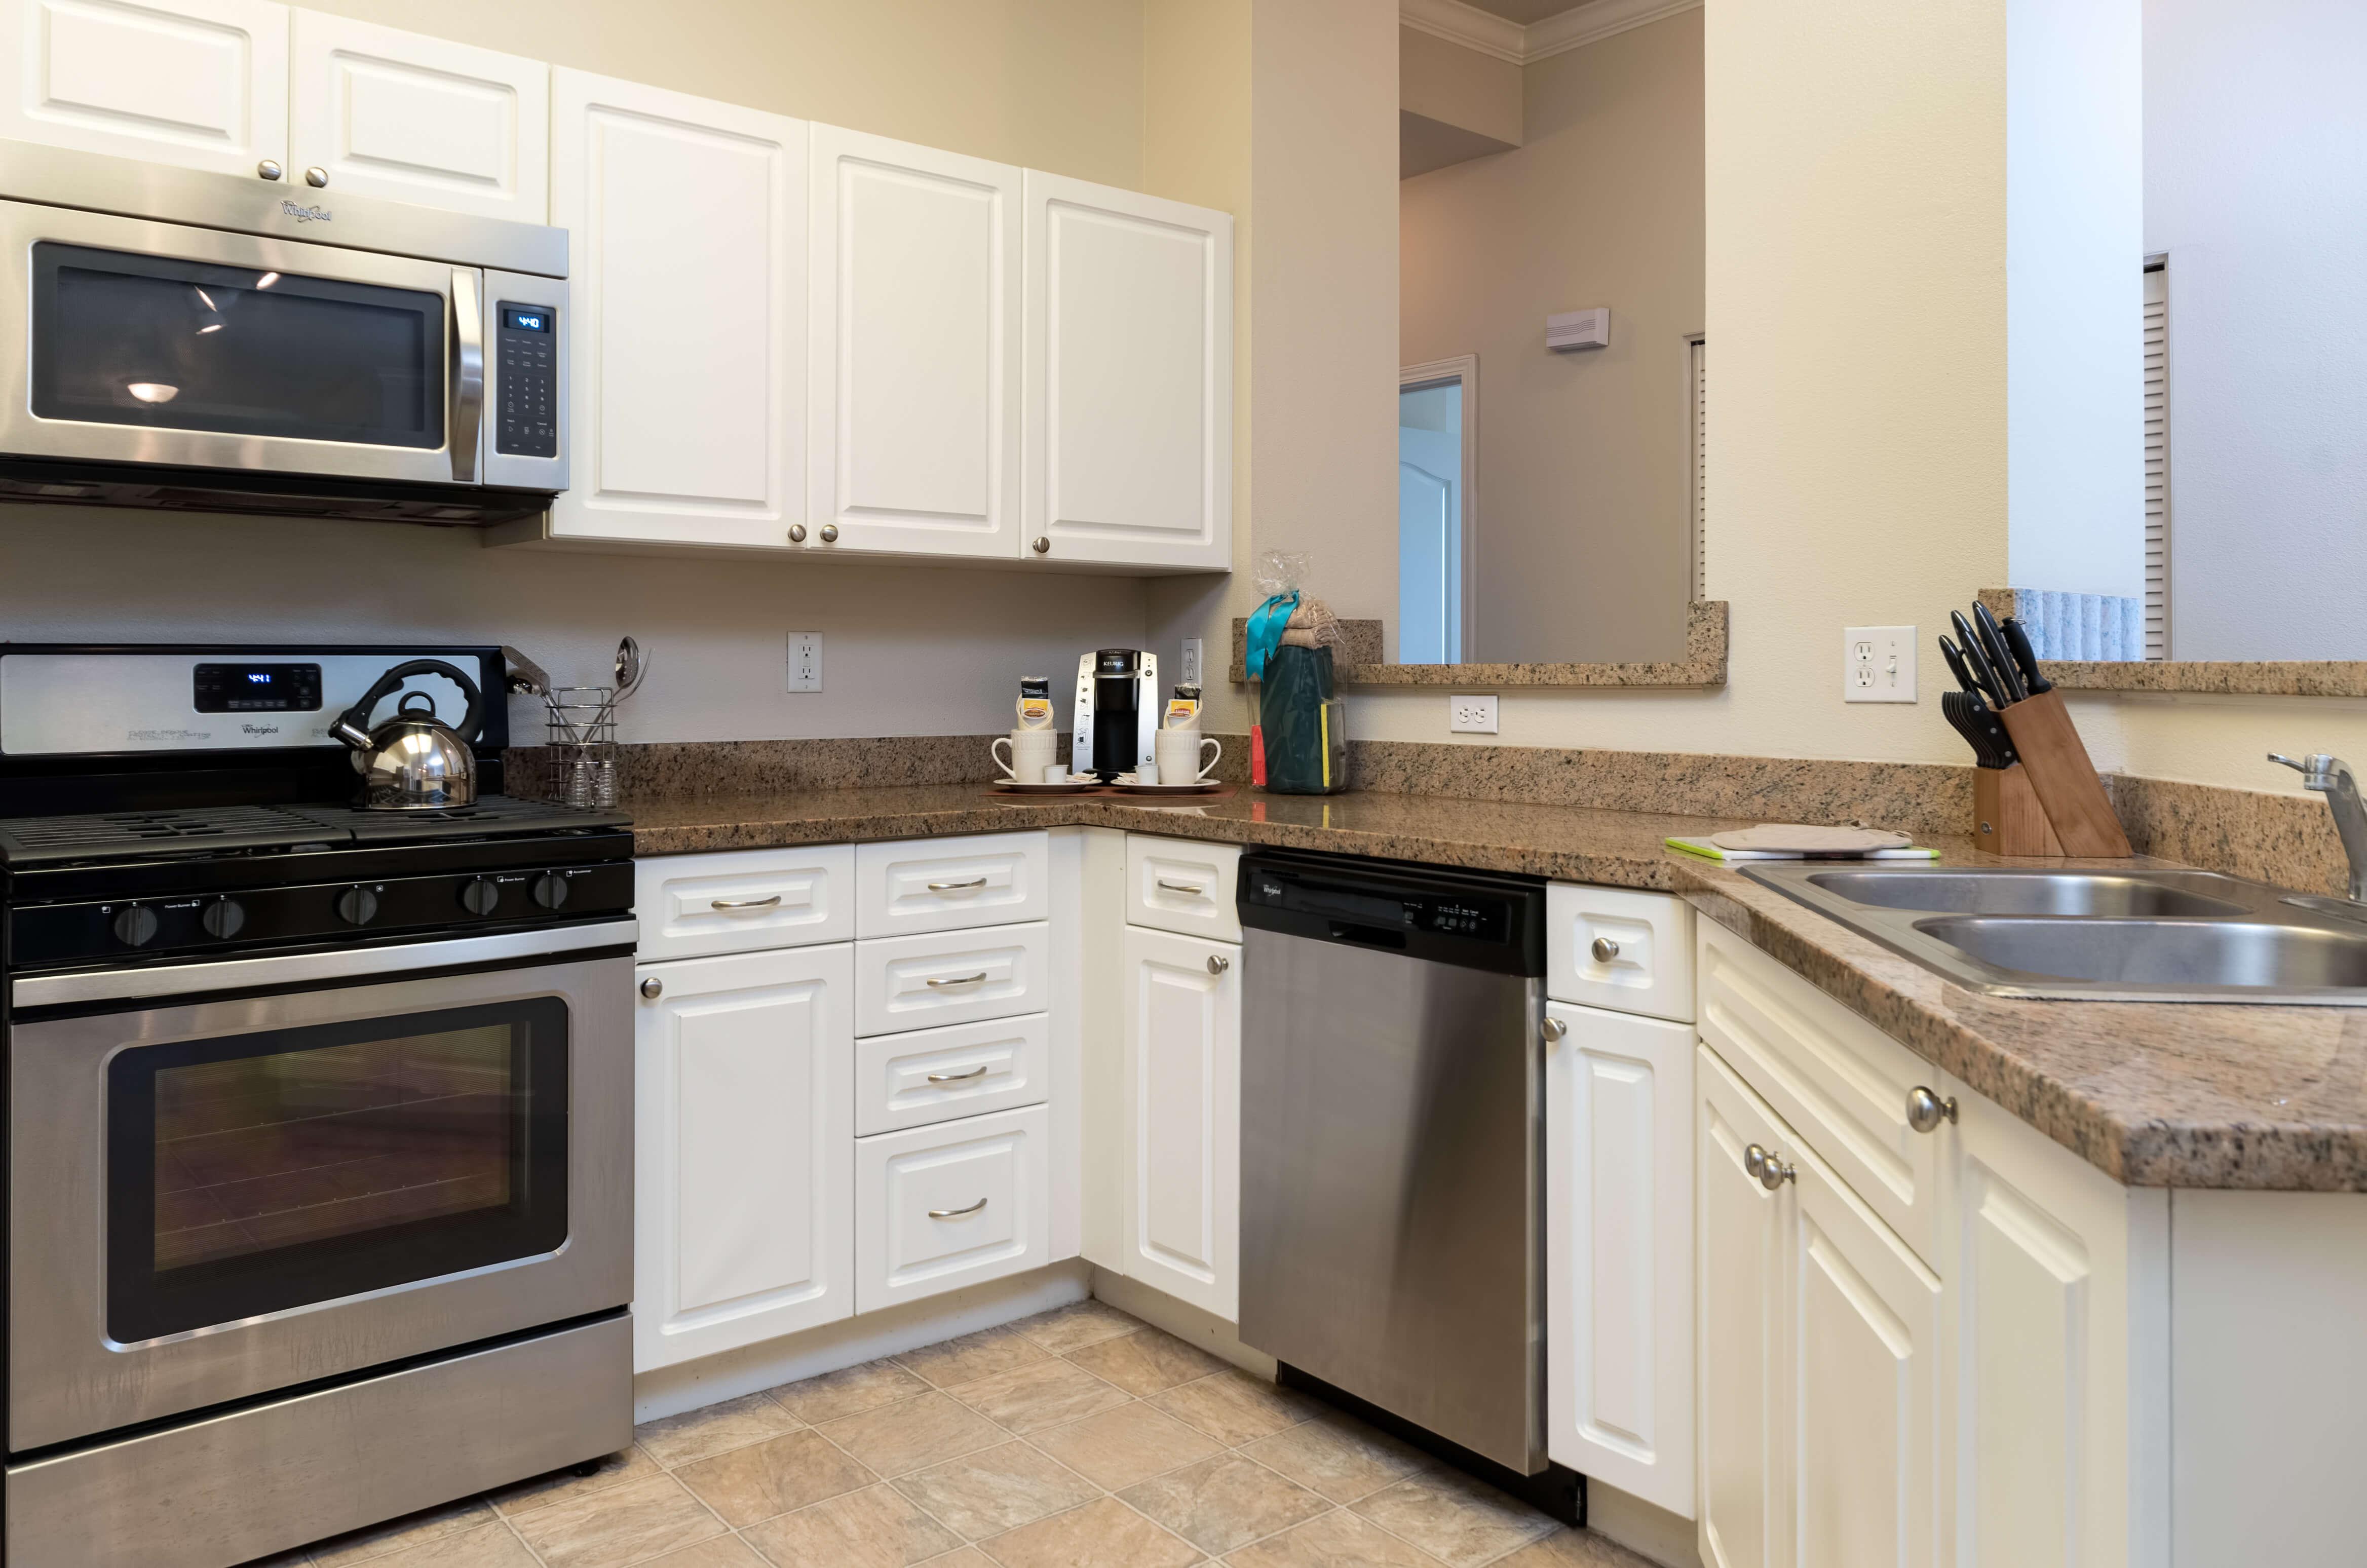 image 4 furnished 3 bedroom Apartment for rent in Santa Clara, Santa Clara County